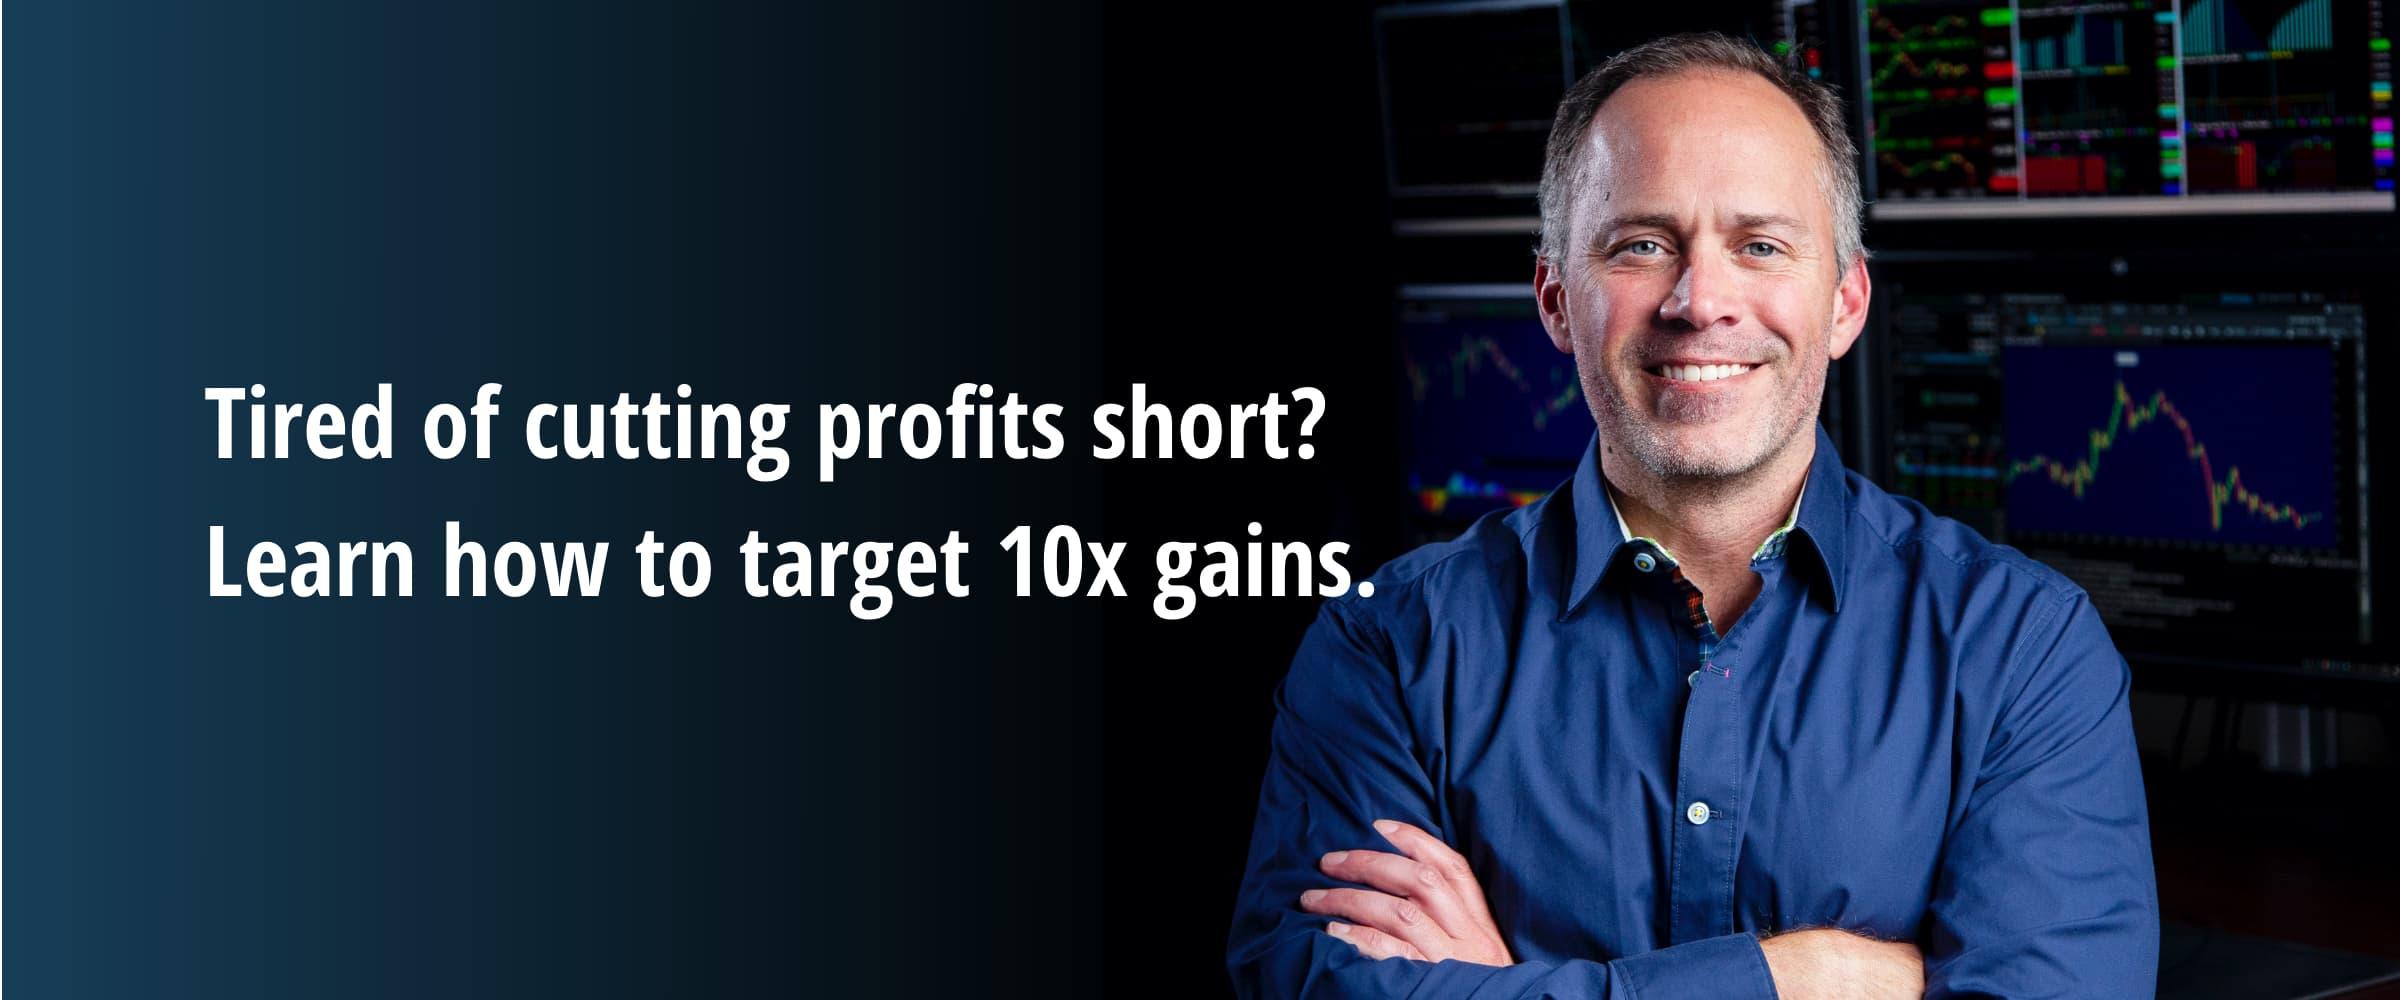 JC_Tired of Cutting Profits@2x